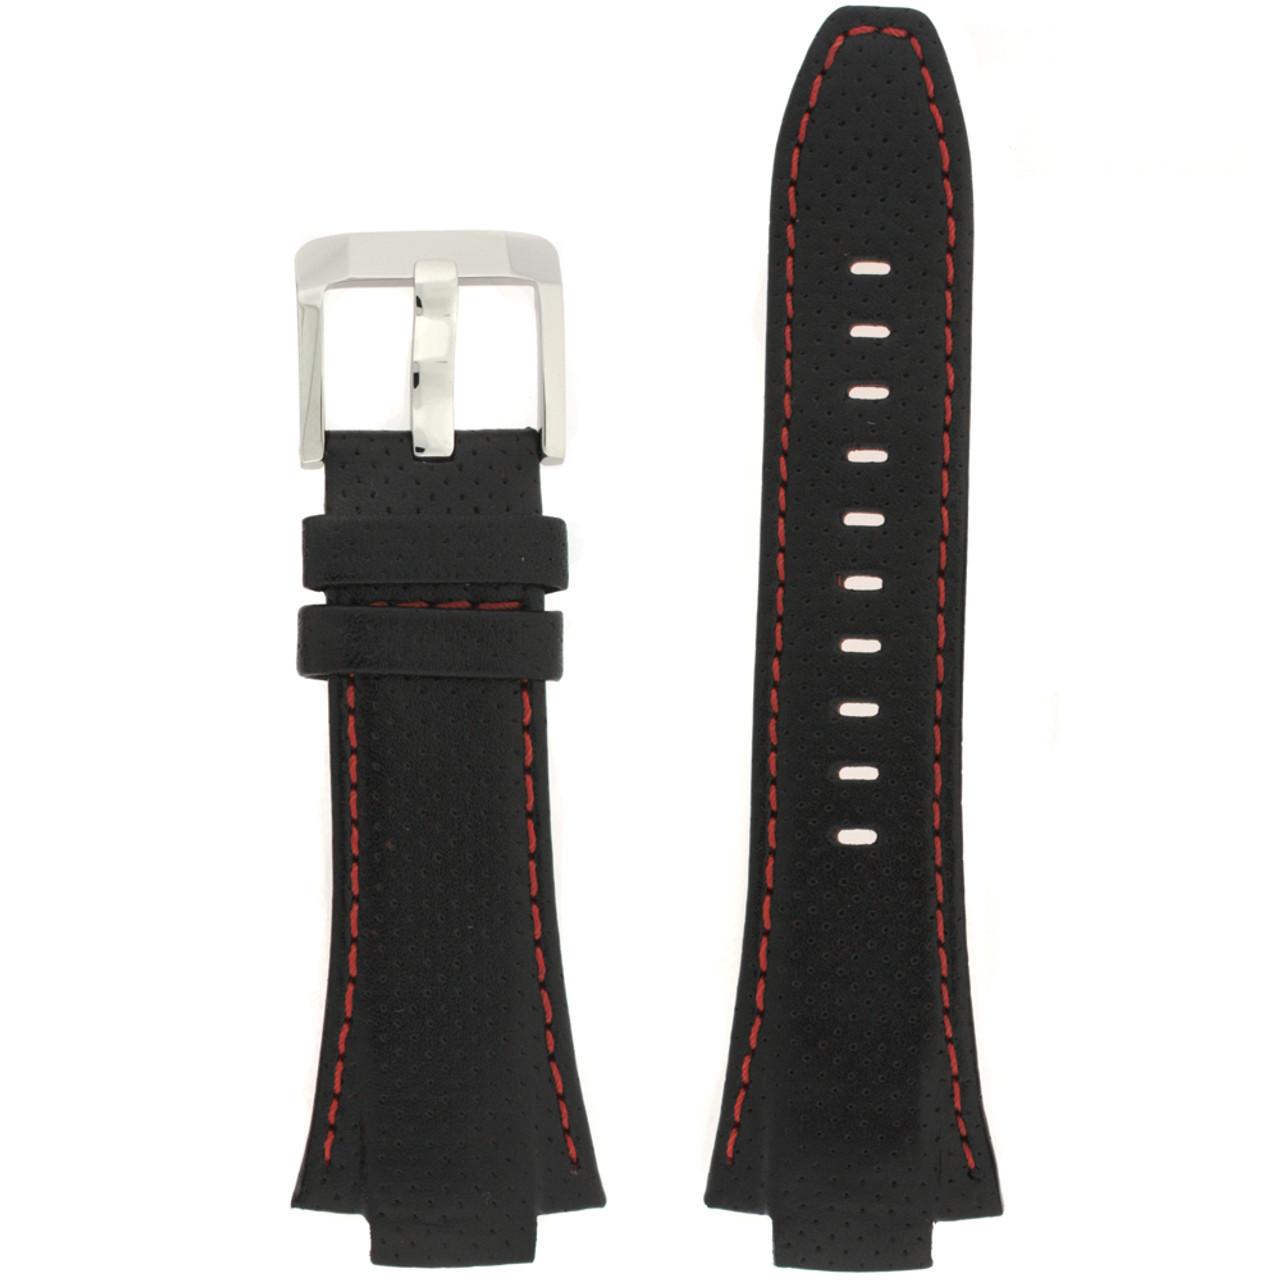 Seiko sportura leather watch bandSNA451 SNA481